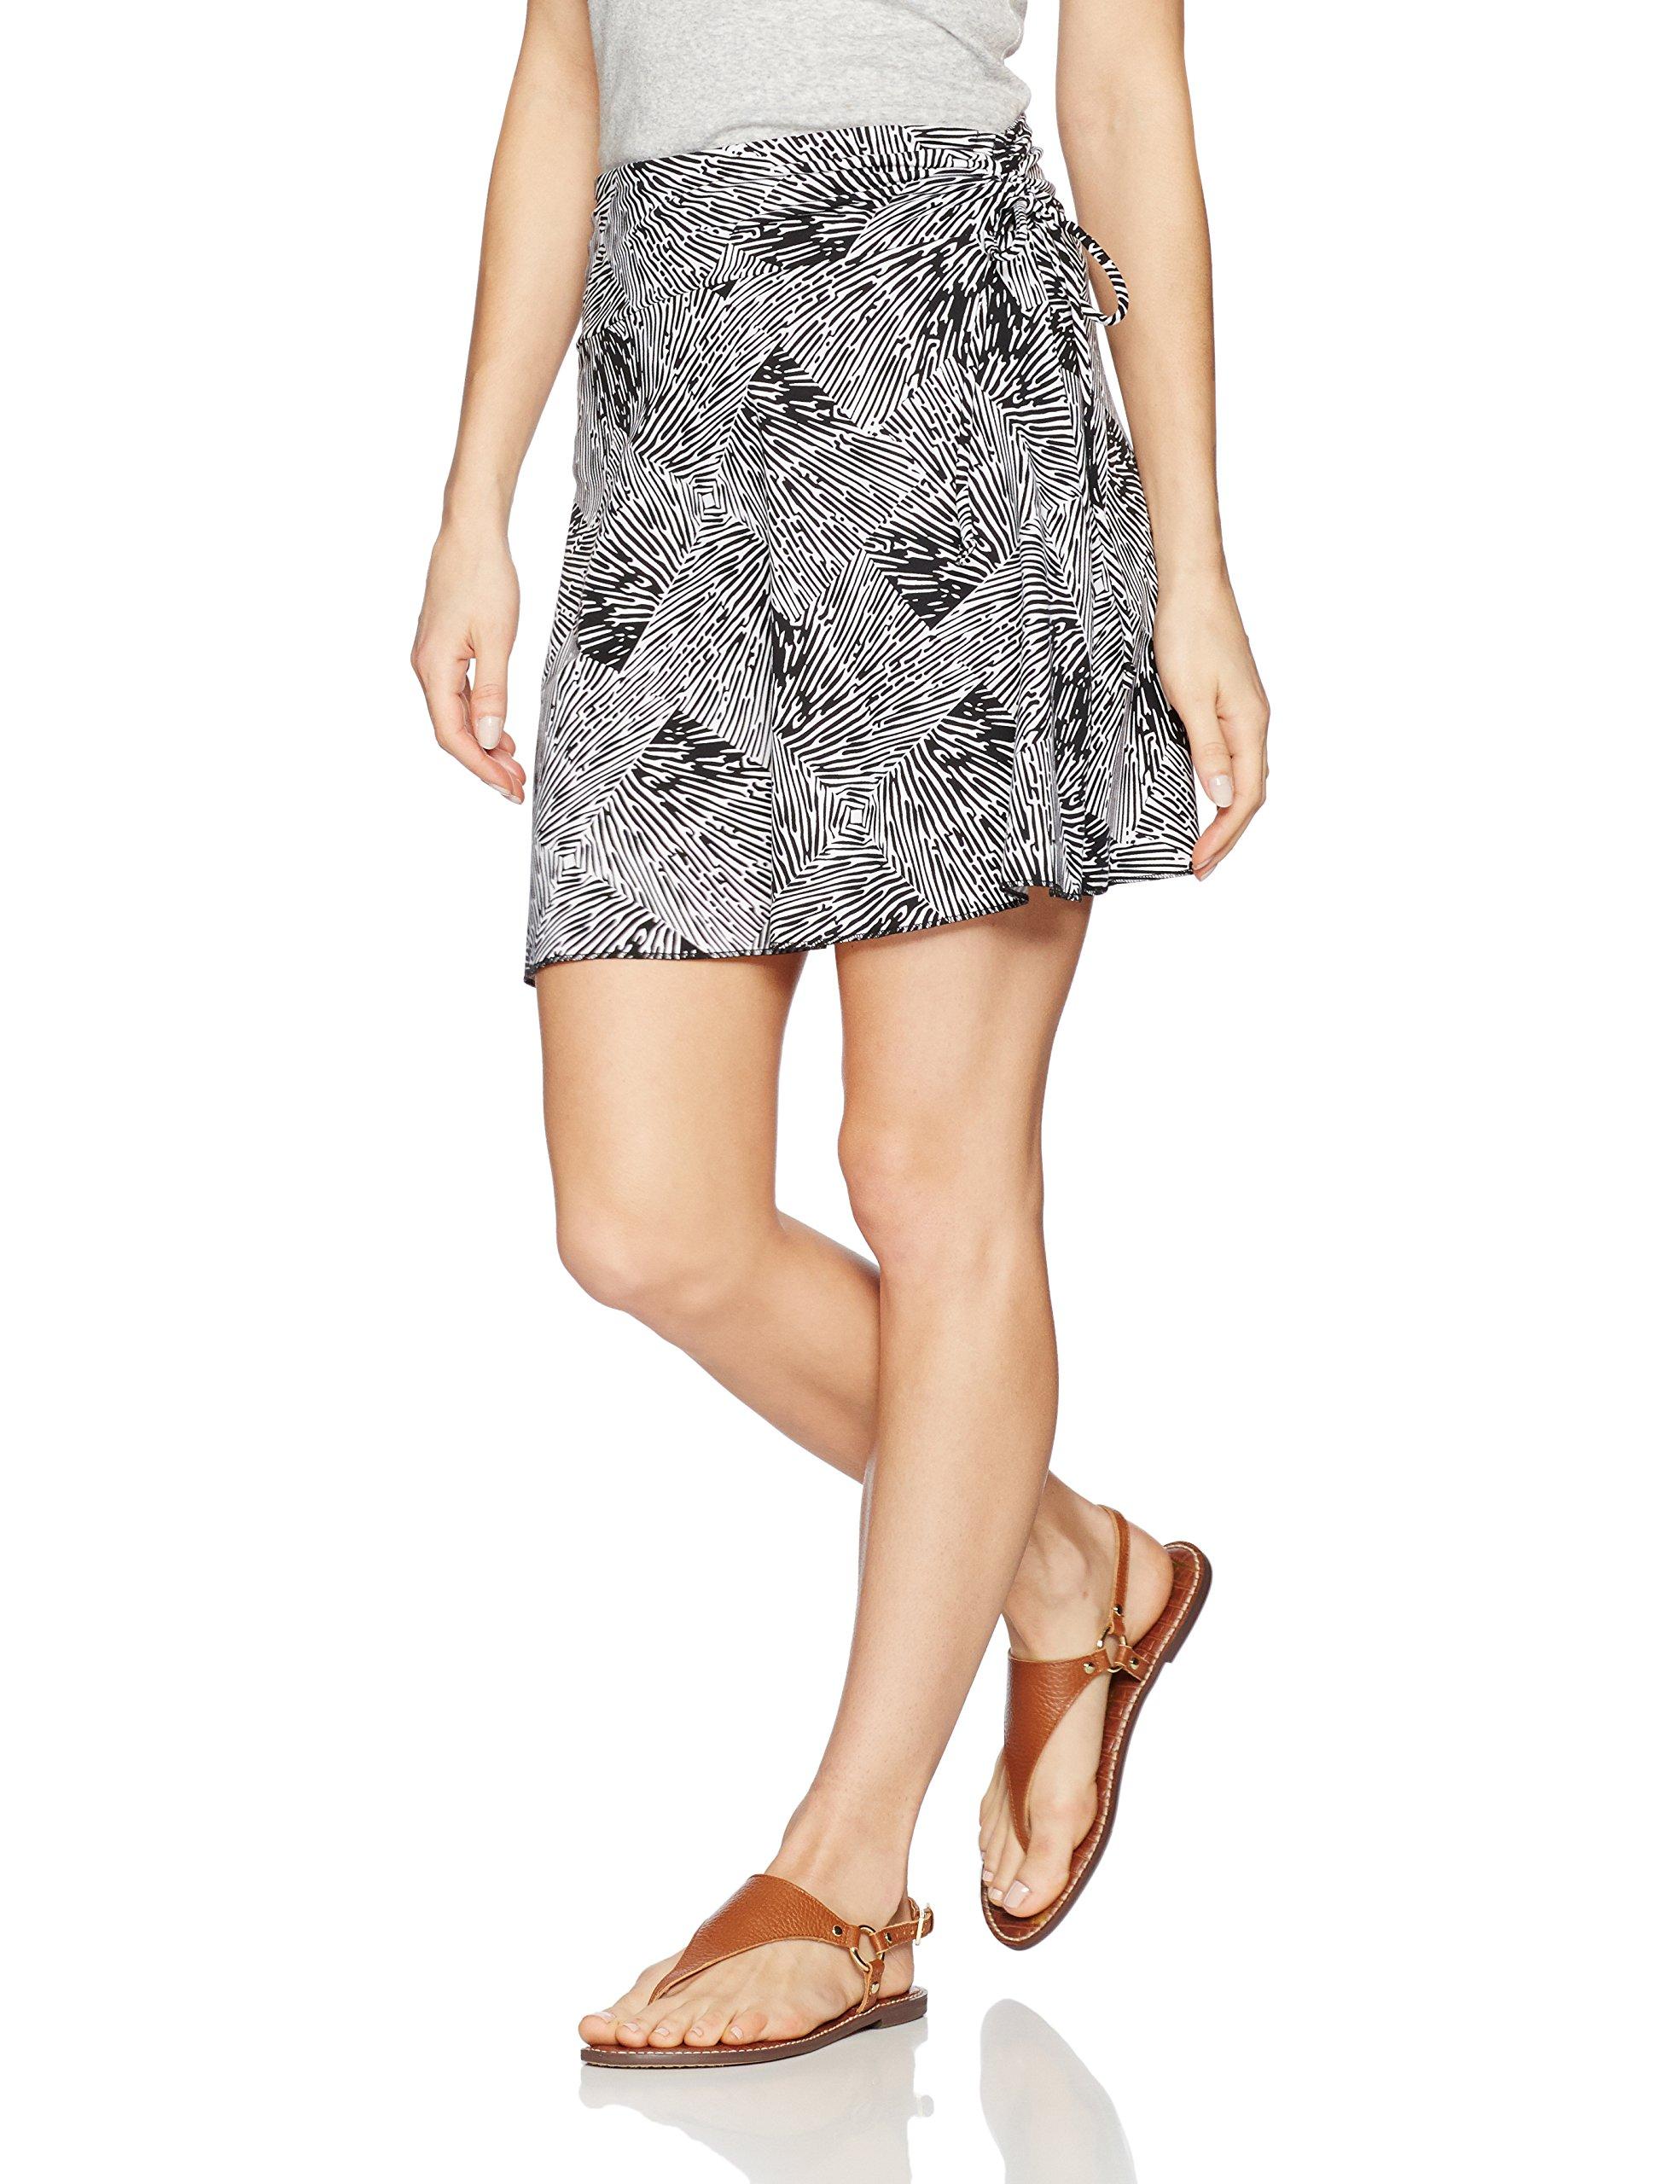 Soybu Women's Serendipity Skirt, Small, Reef by Soybu